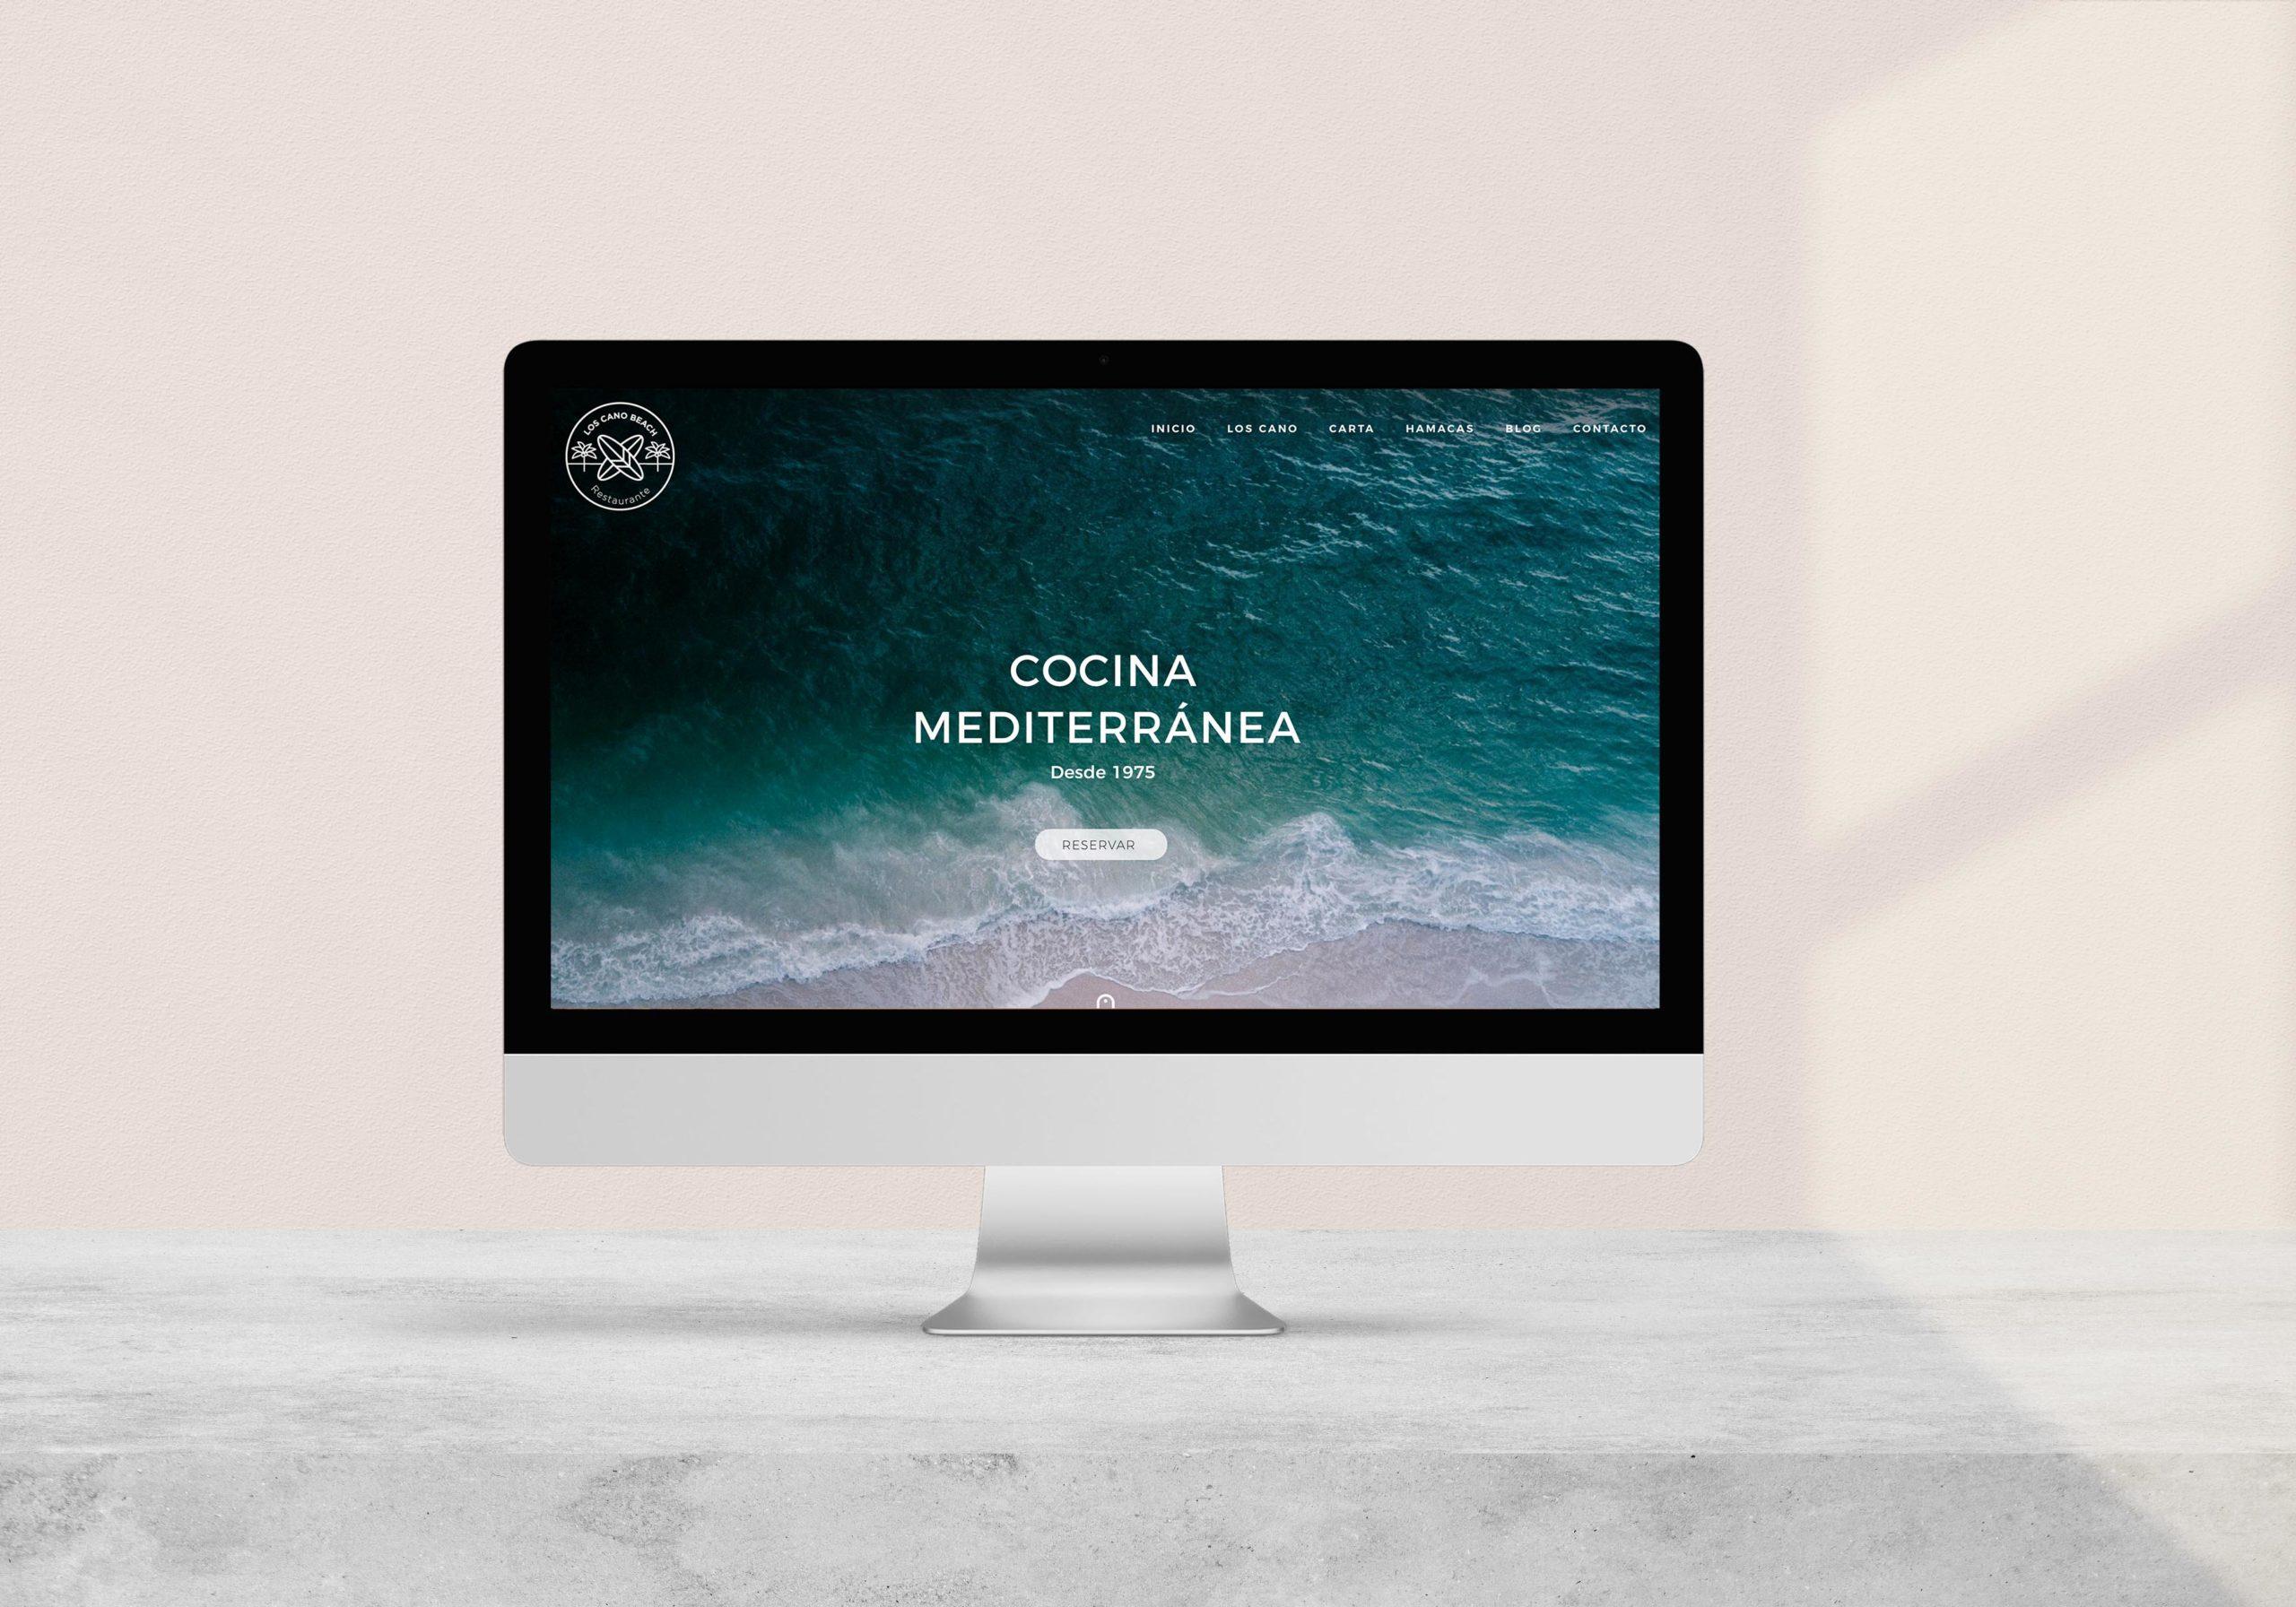 Marketing Digies Los Cano Beach Web Project